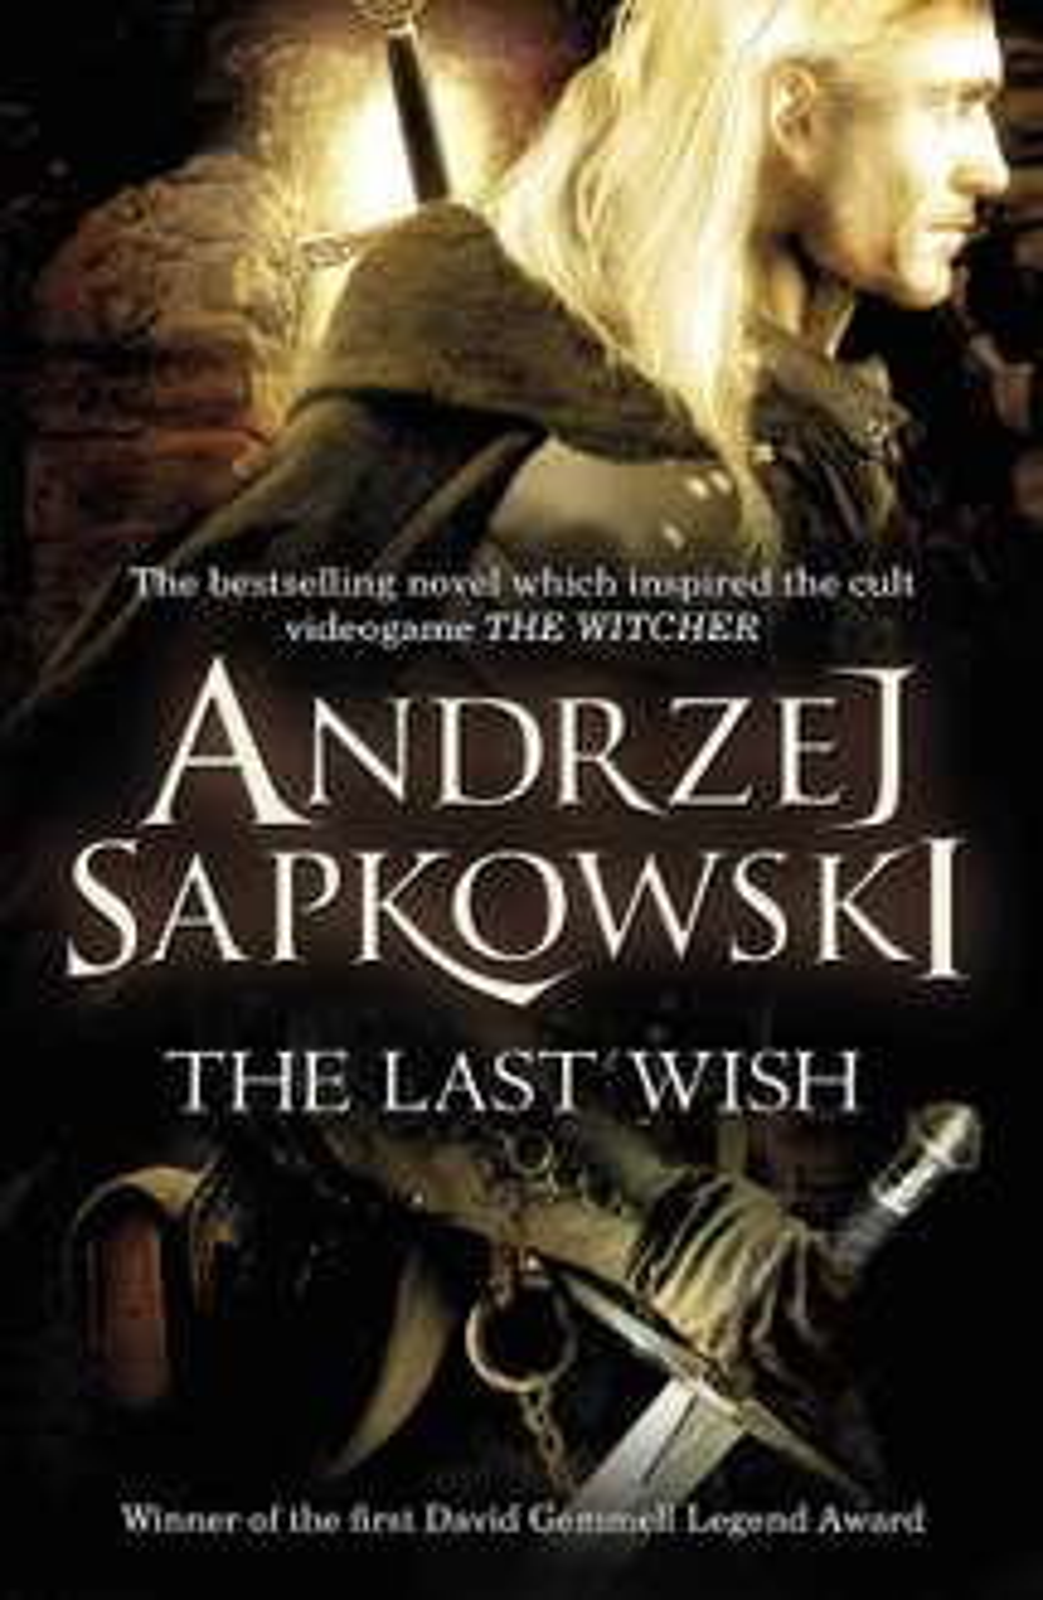 [Kindle] The Witcher Bücher in englisch ab 0,99€